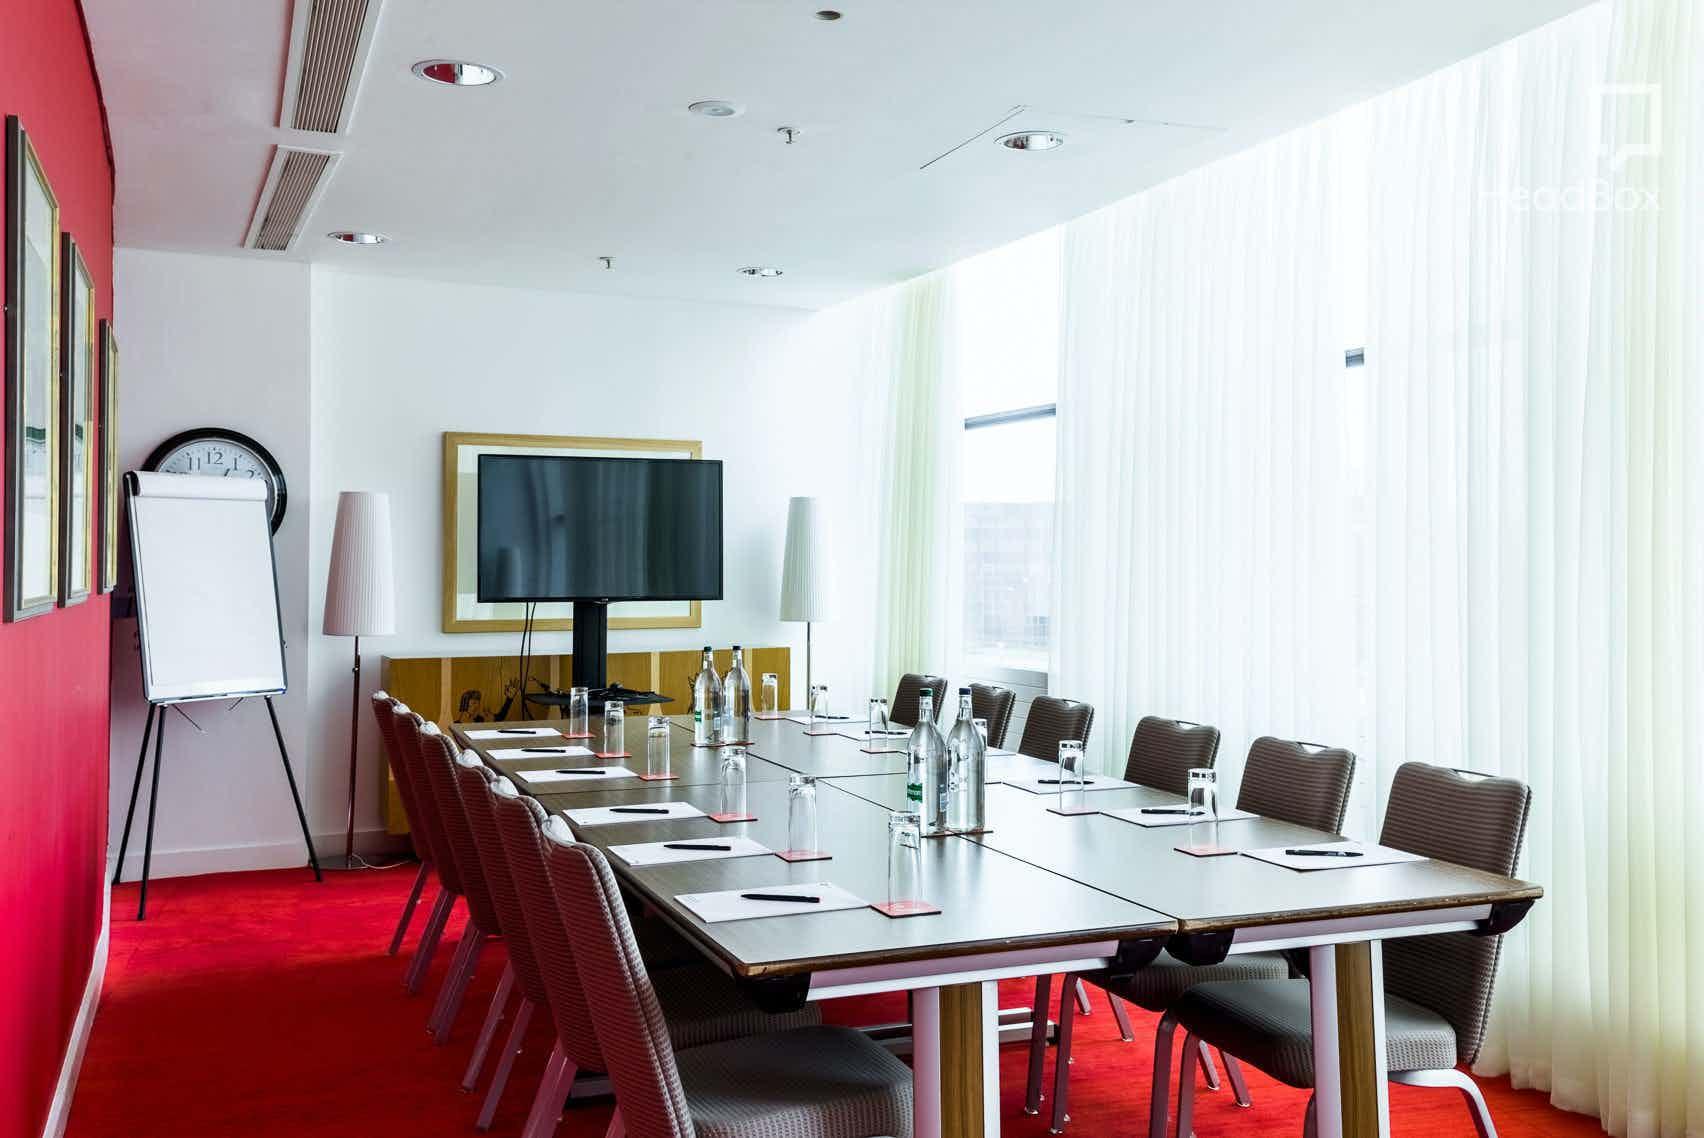 Winteringham VIP Room, The Rep